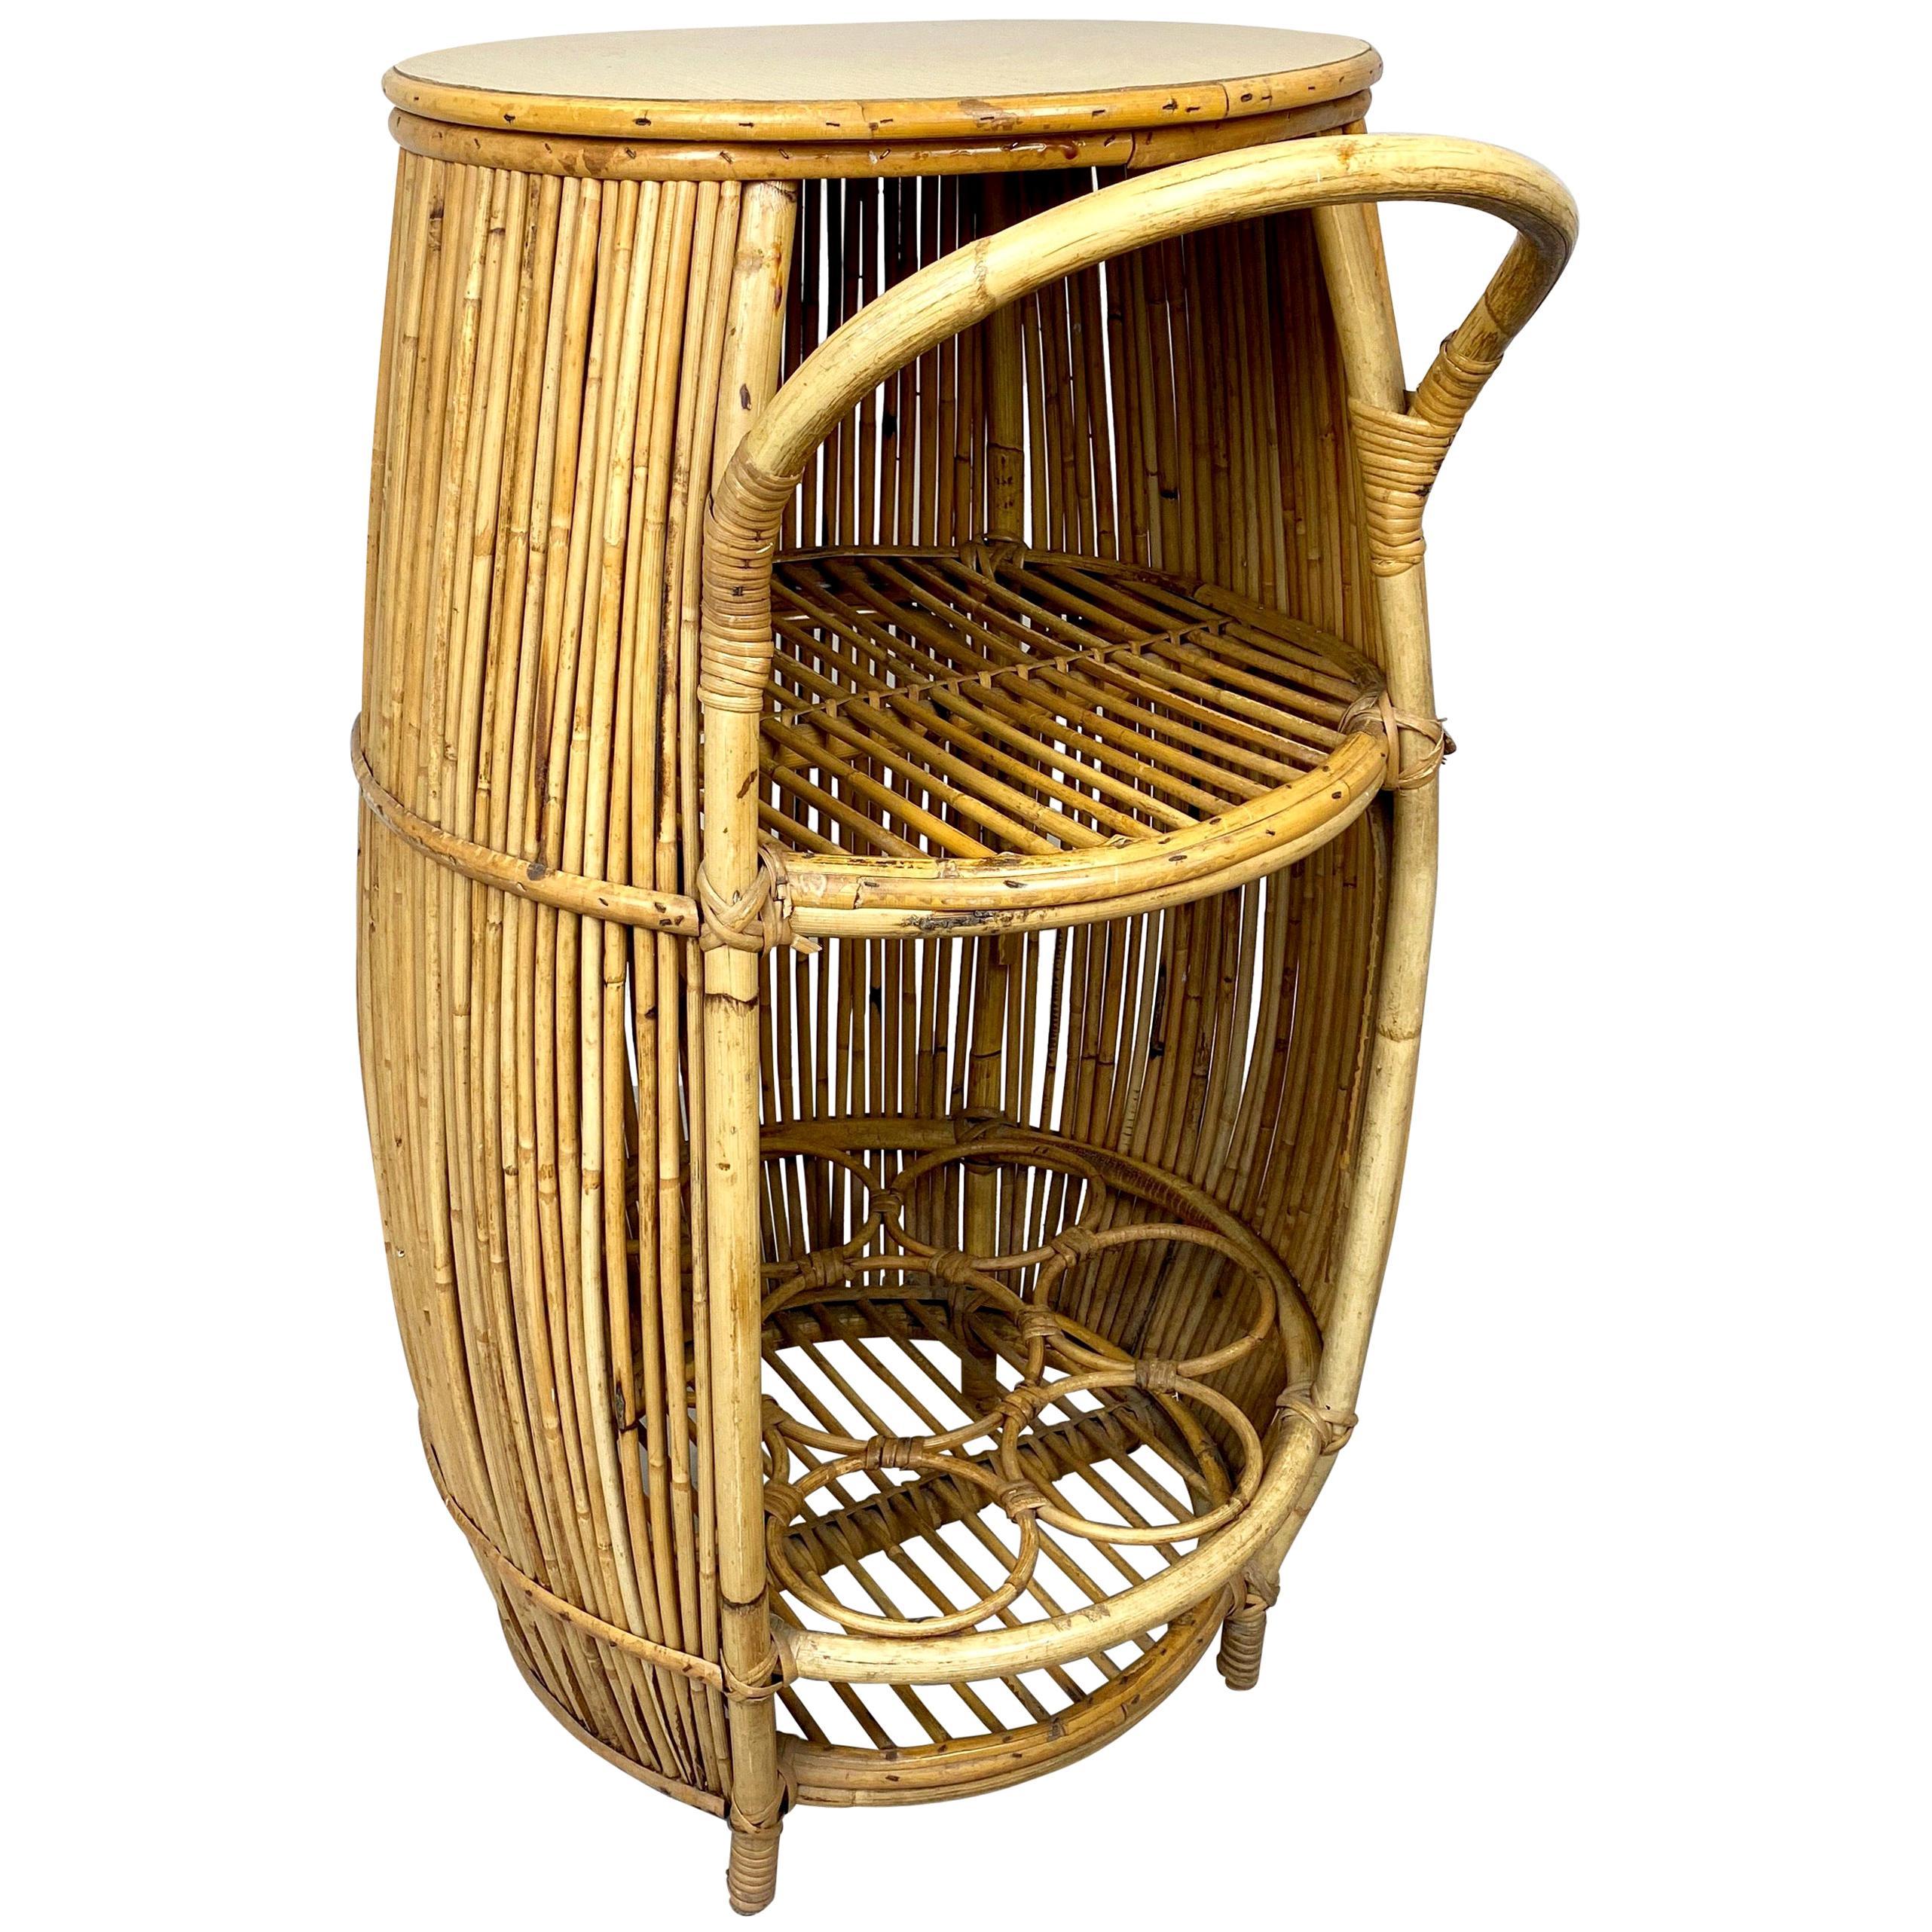 Bamboo Rattan Barrel Bar Cart Cabinet, Italy, 1960s